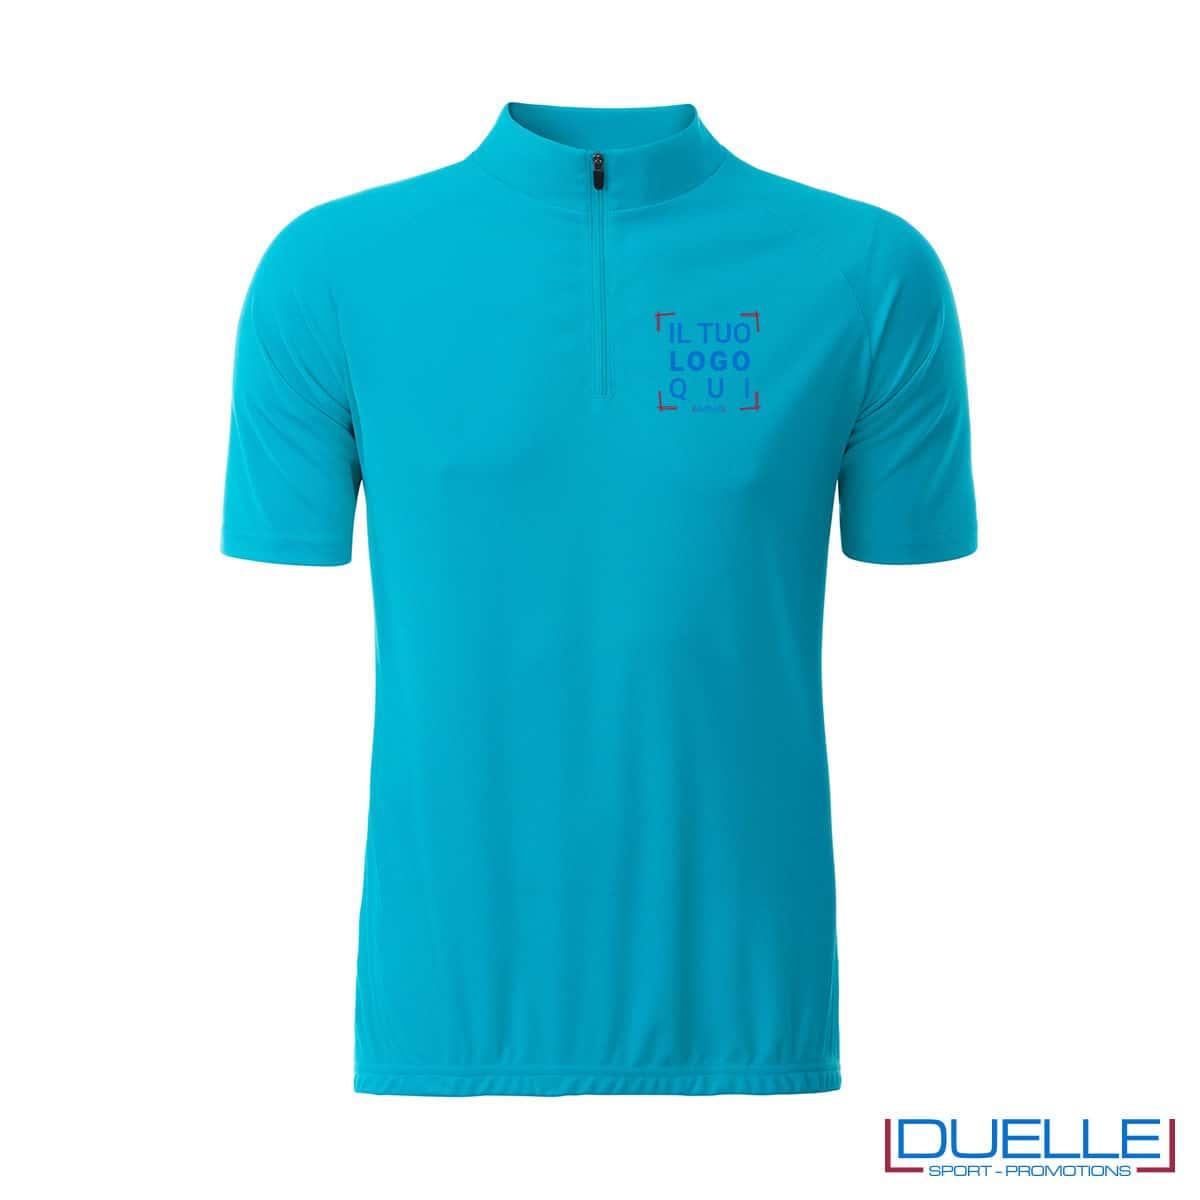 polo azzurra mezza zip con logo per biking